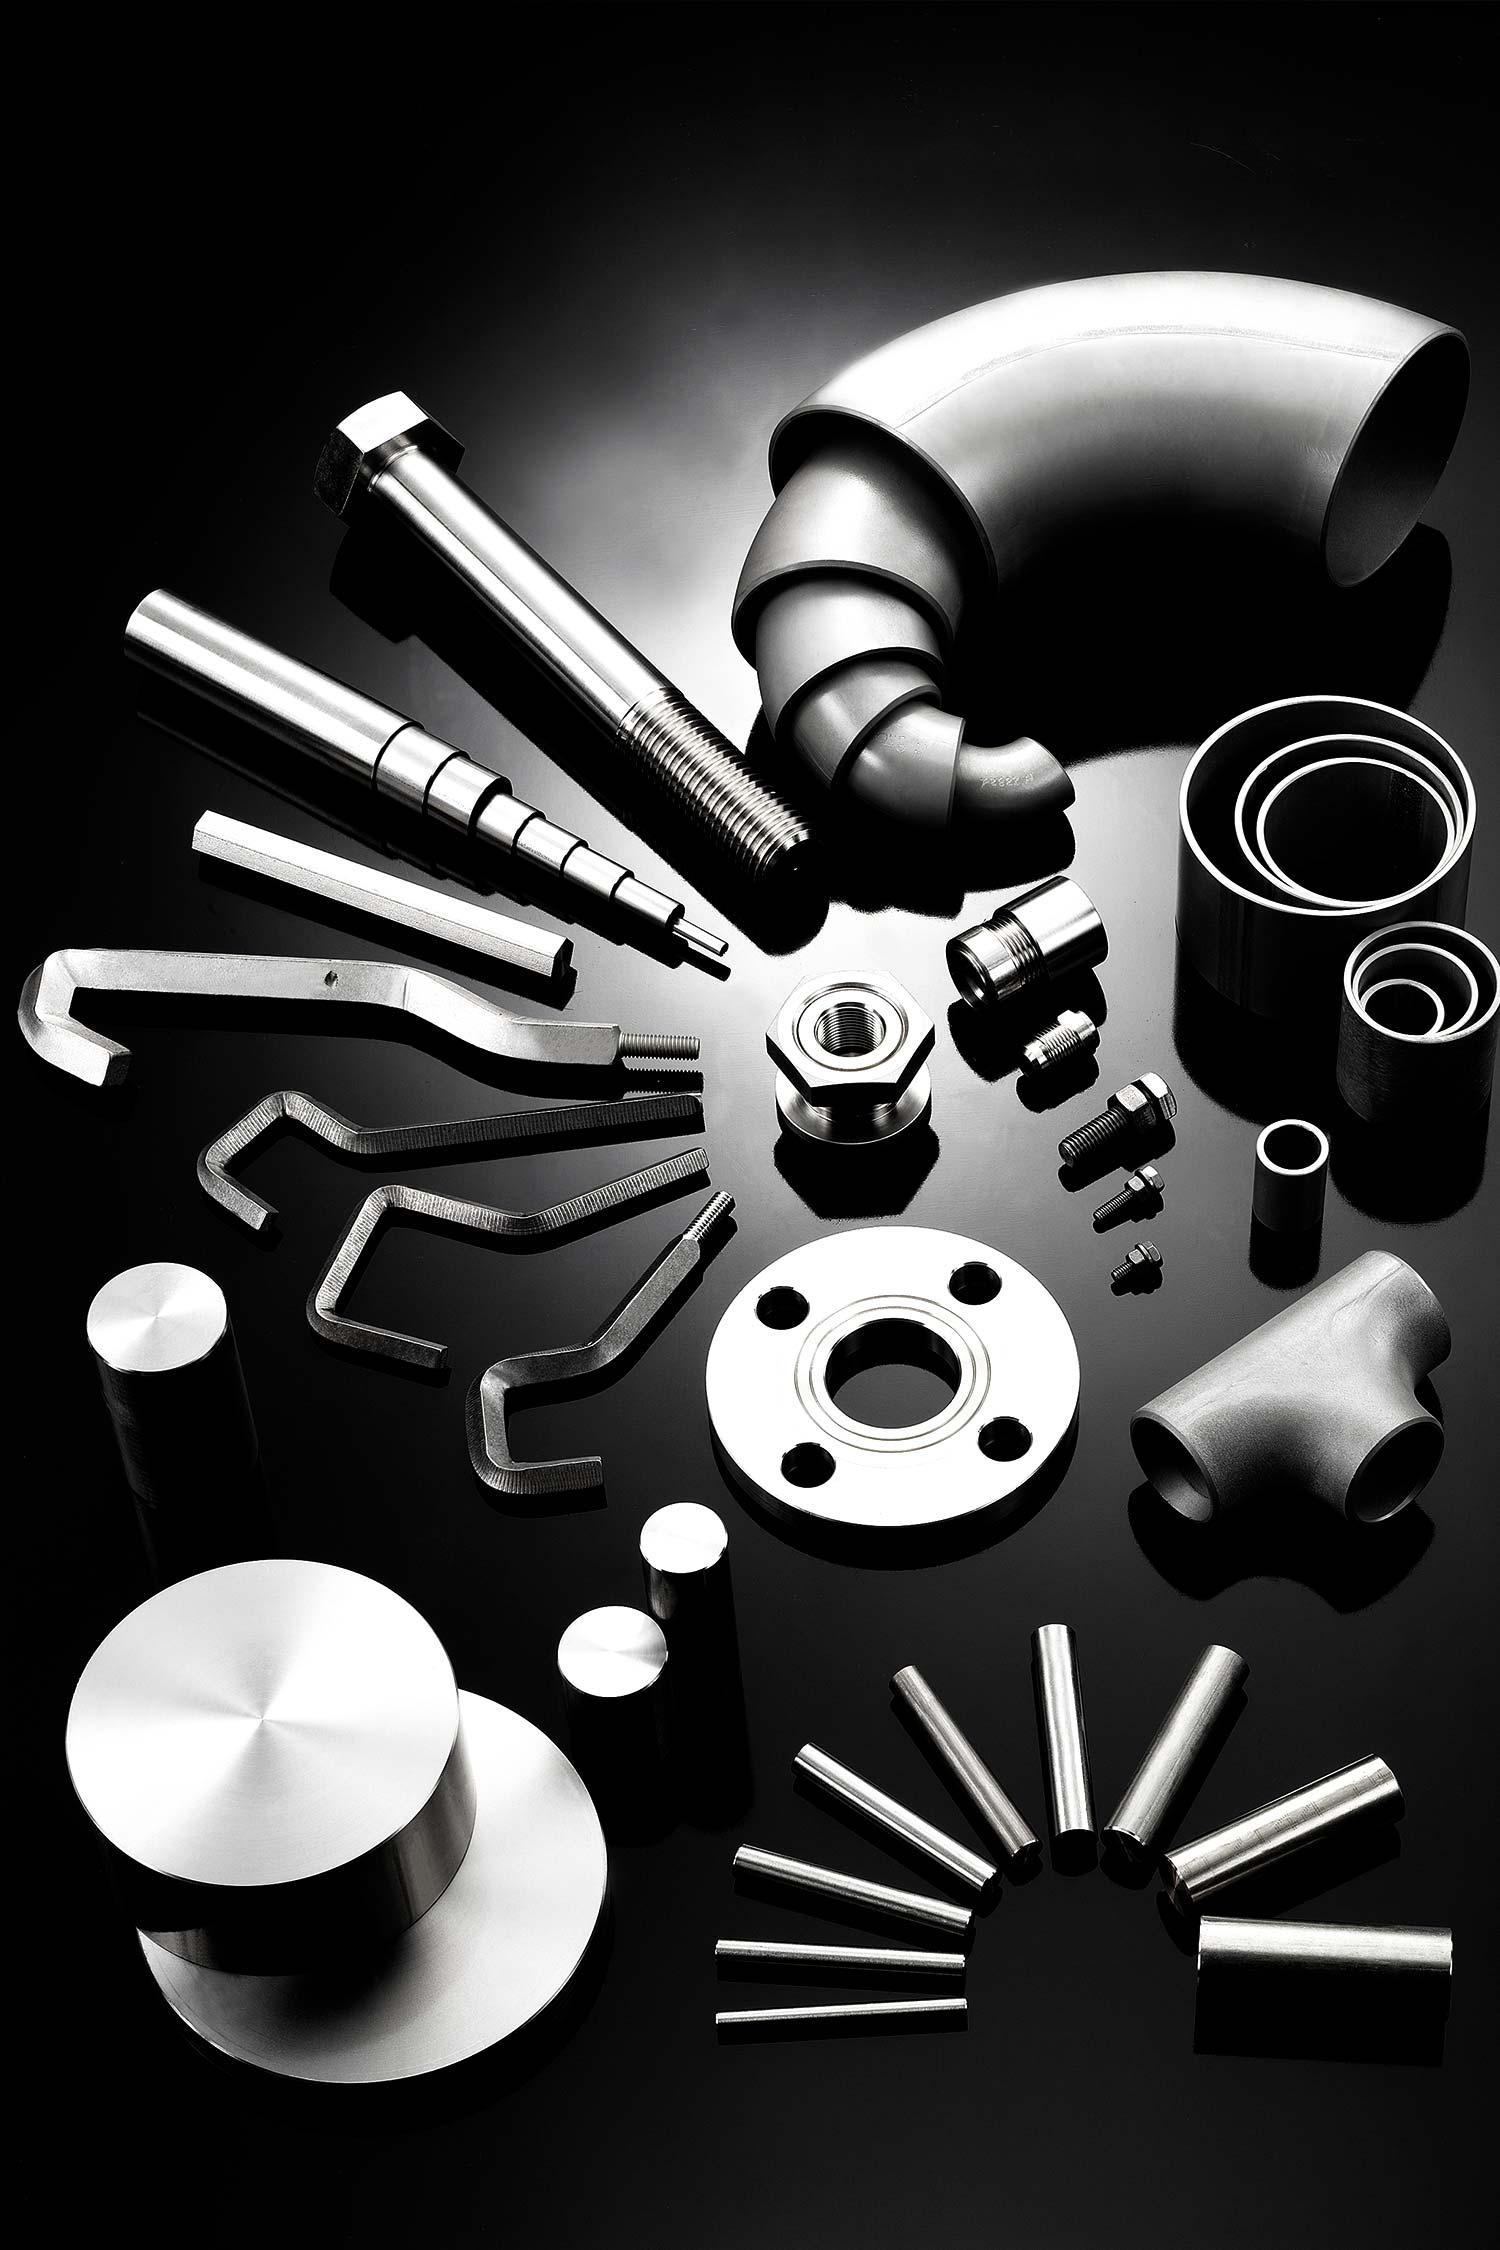 Timate Titanium Customized Products